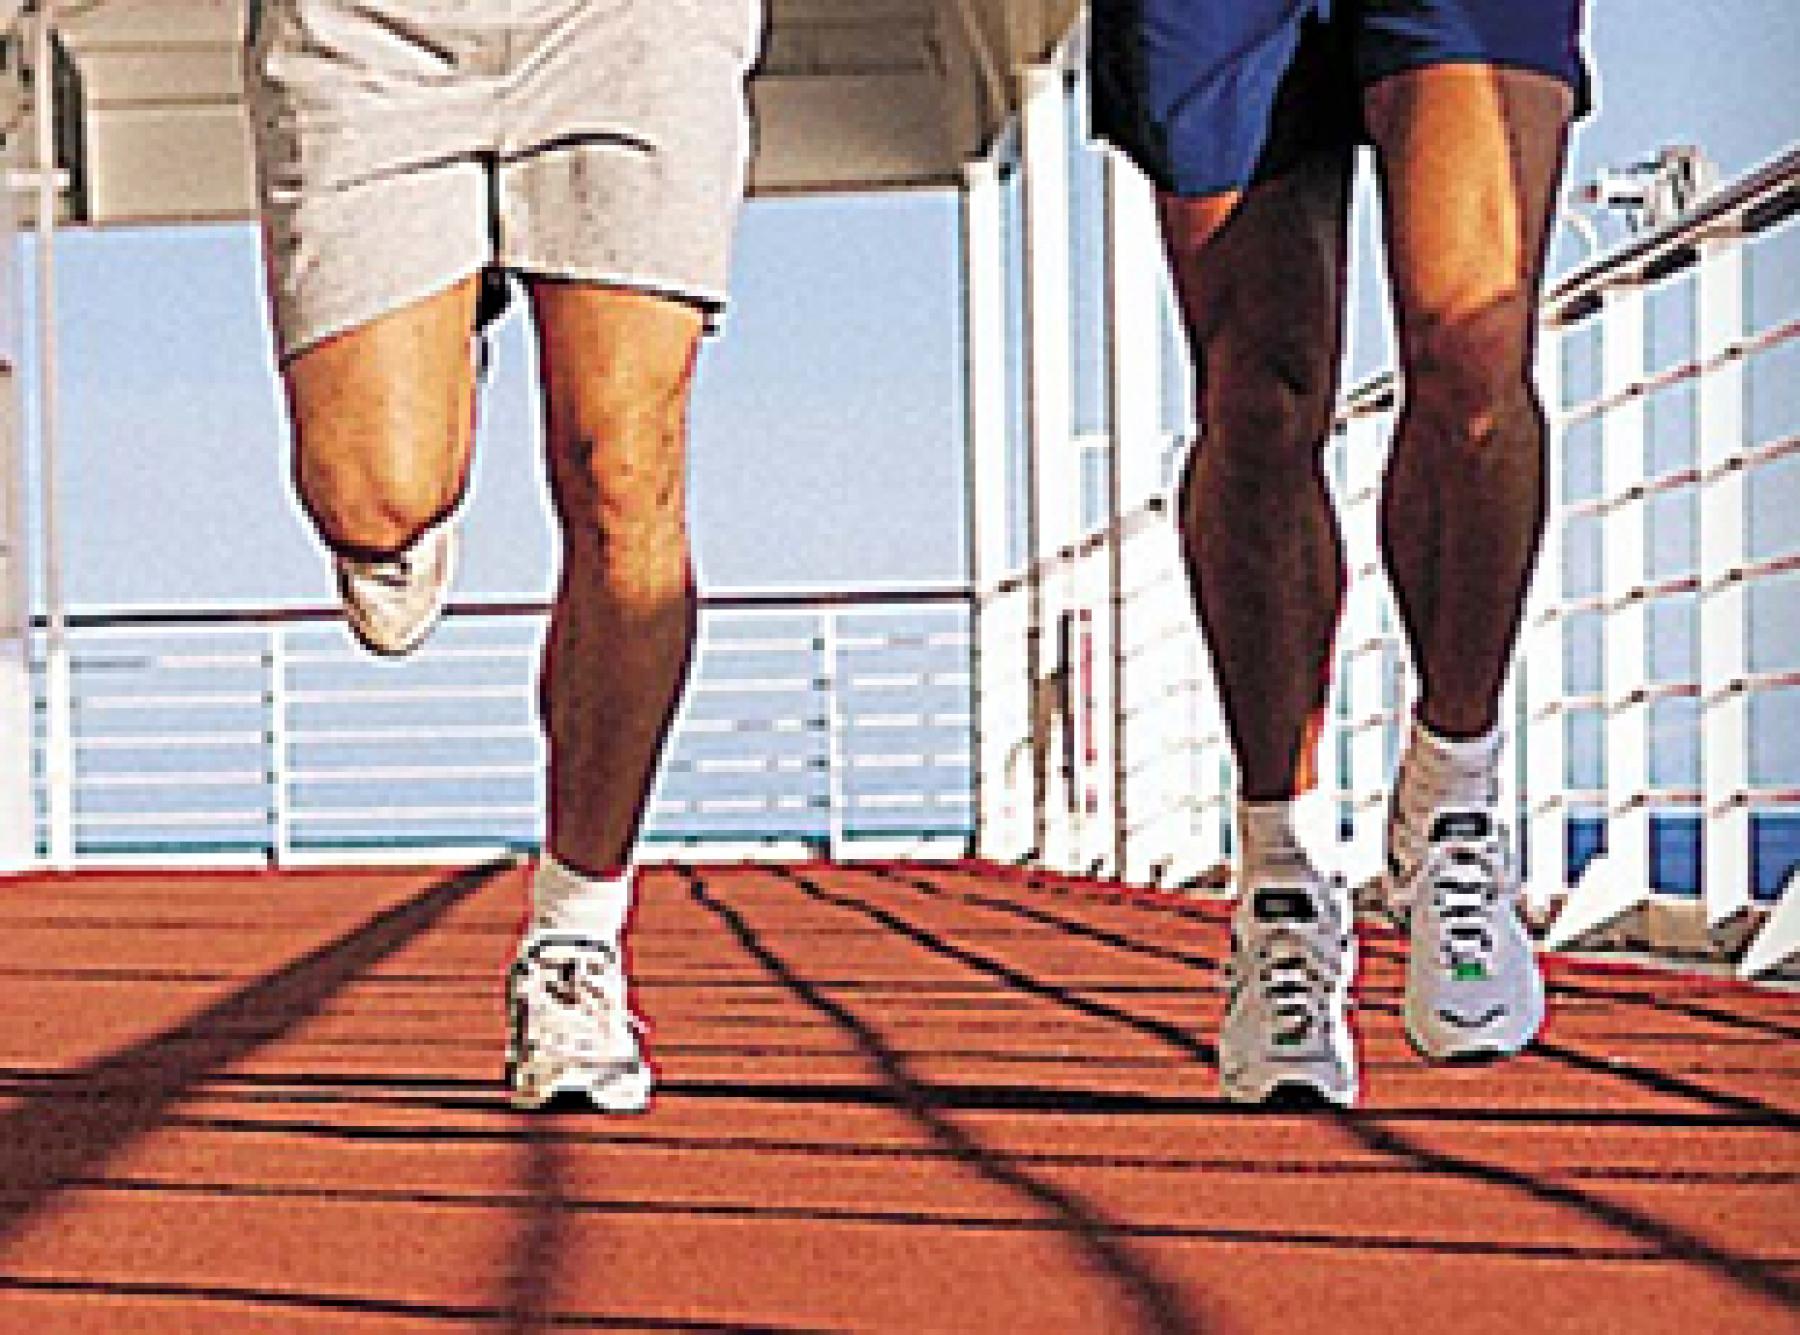 Norwegian Cruise Line Norwegian Epic Exterior Jogging:Walking Track.jpg